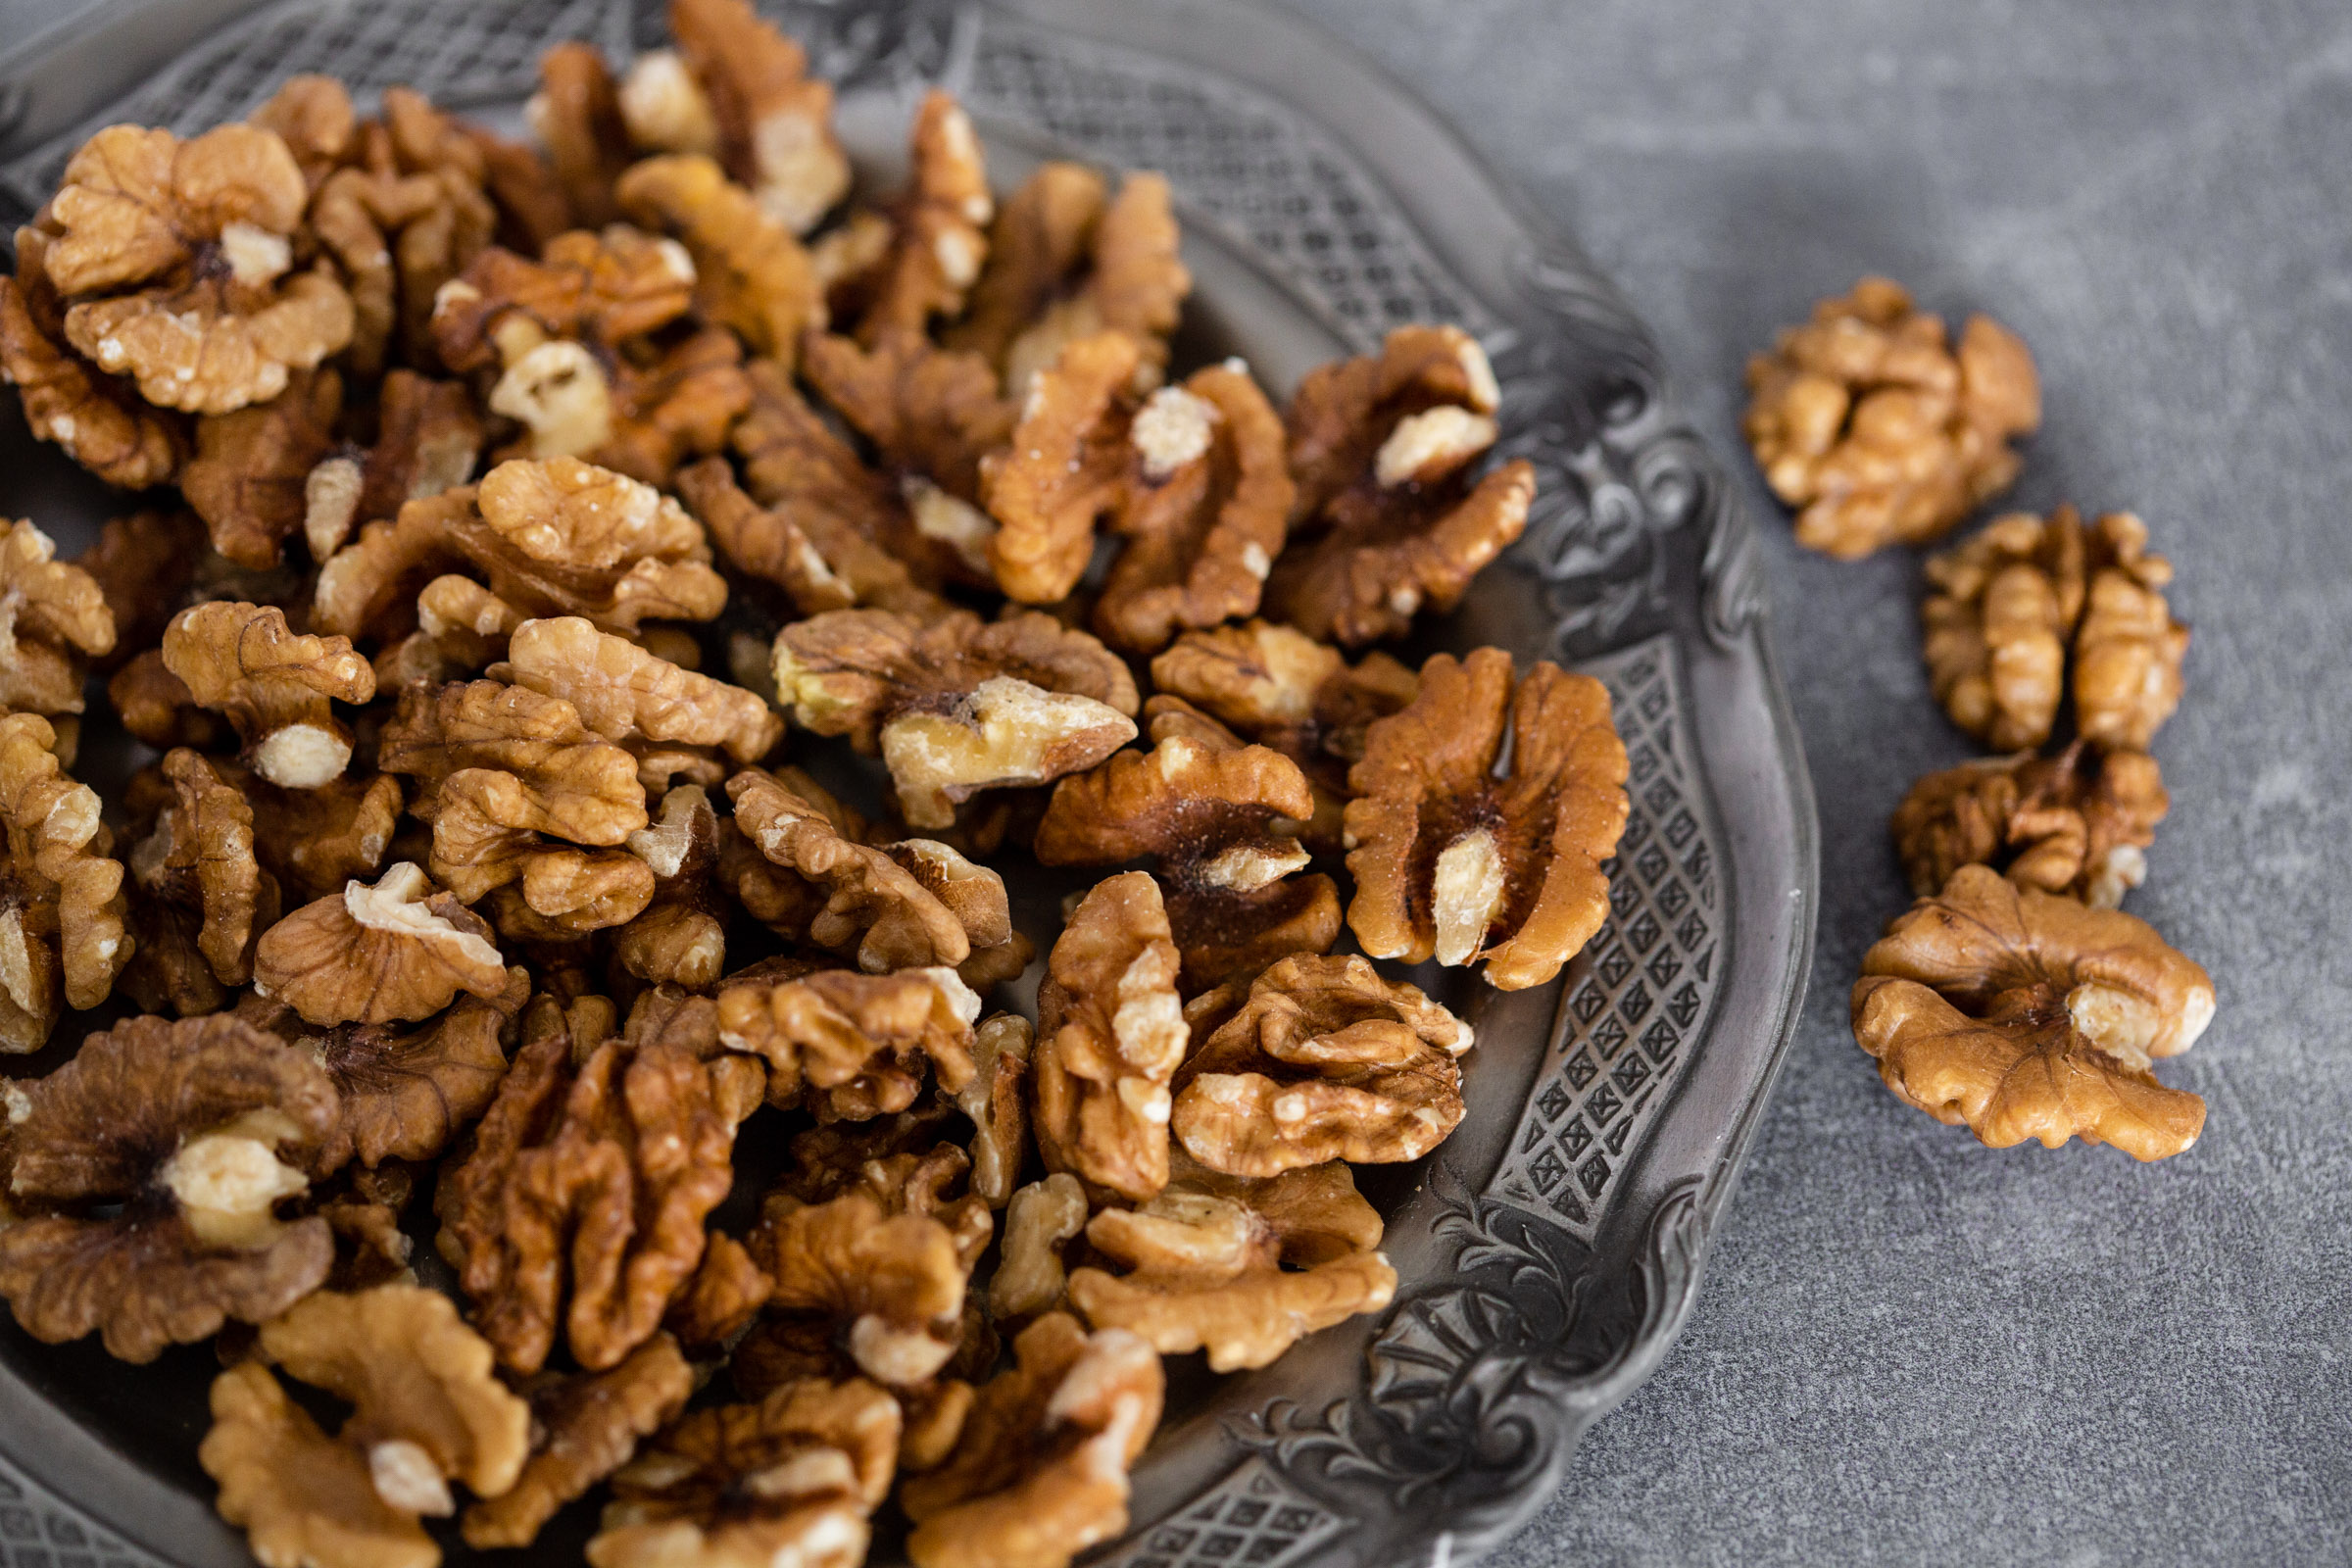 Raw organic walnuts for vegan and raw recipes.